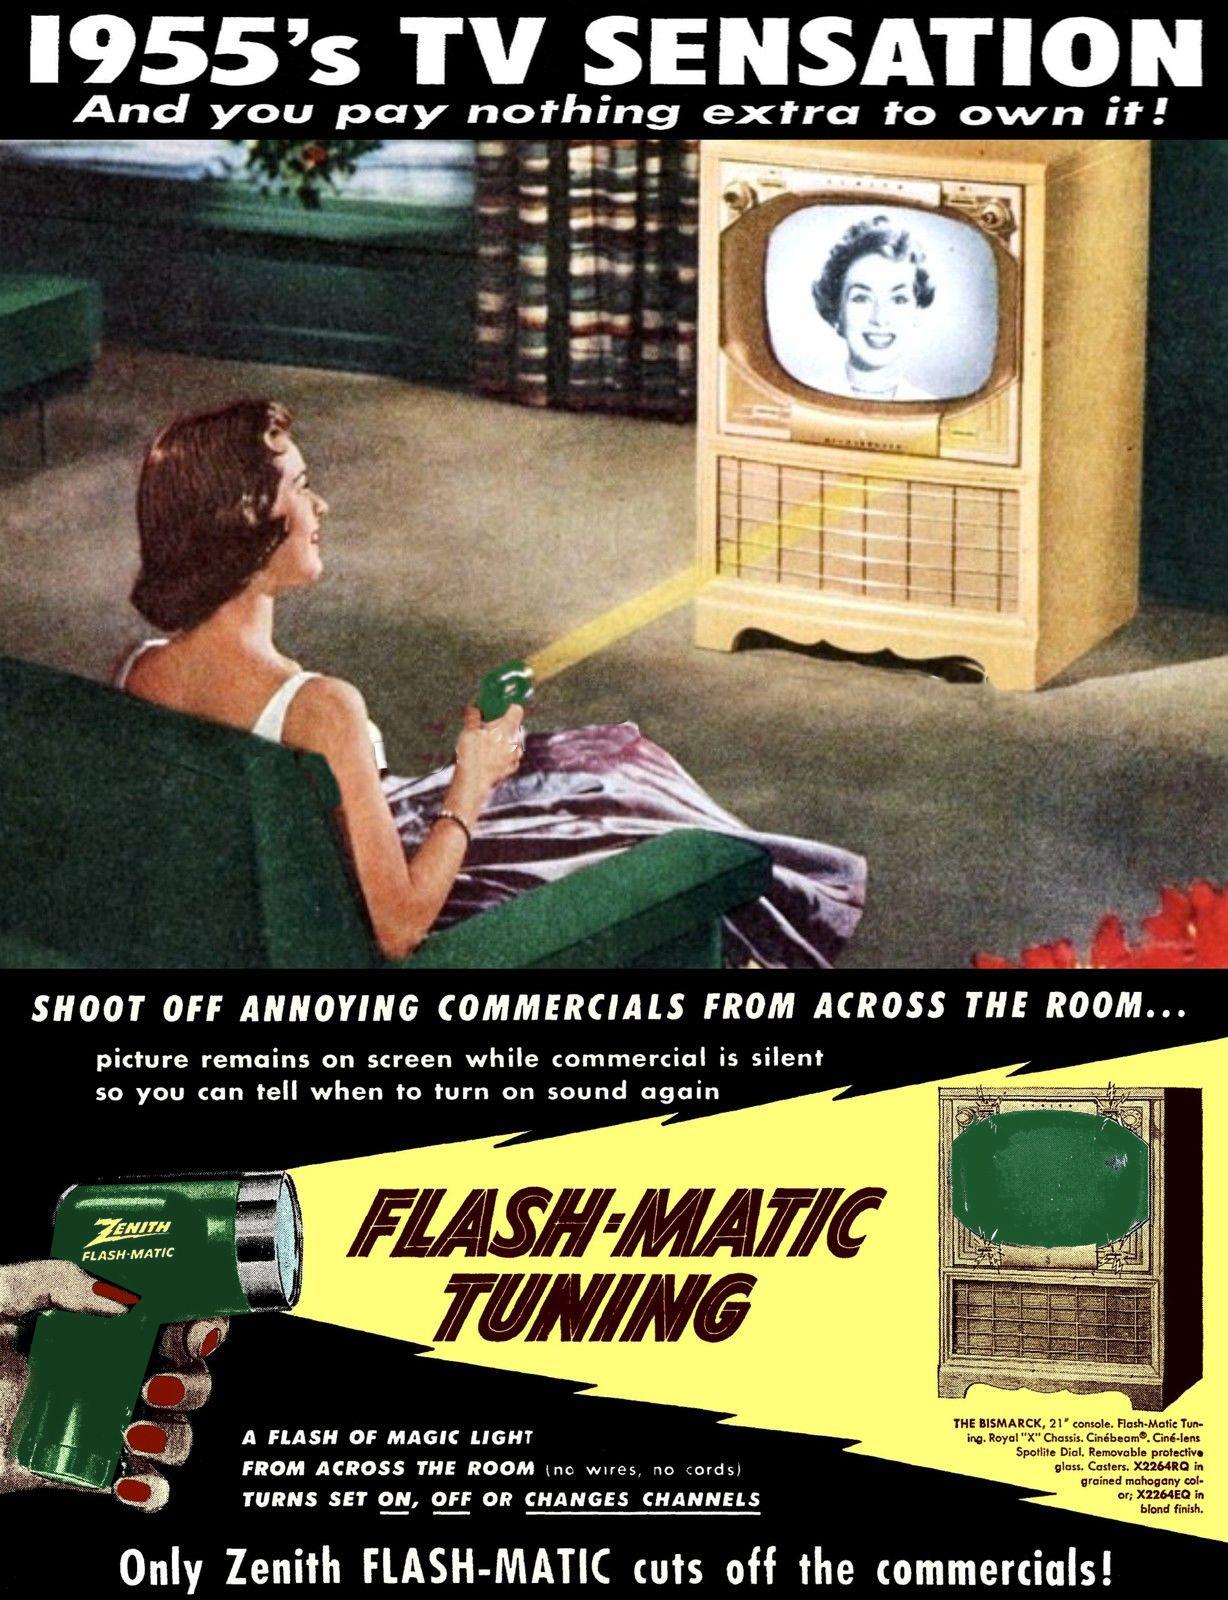 flashmatic ad in color.jpg